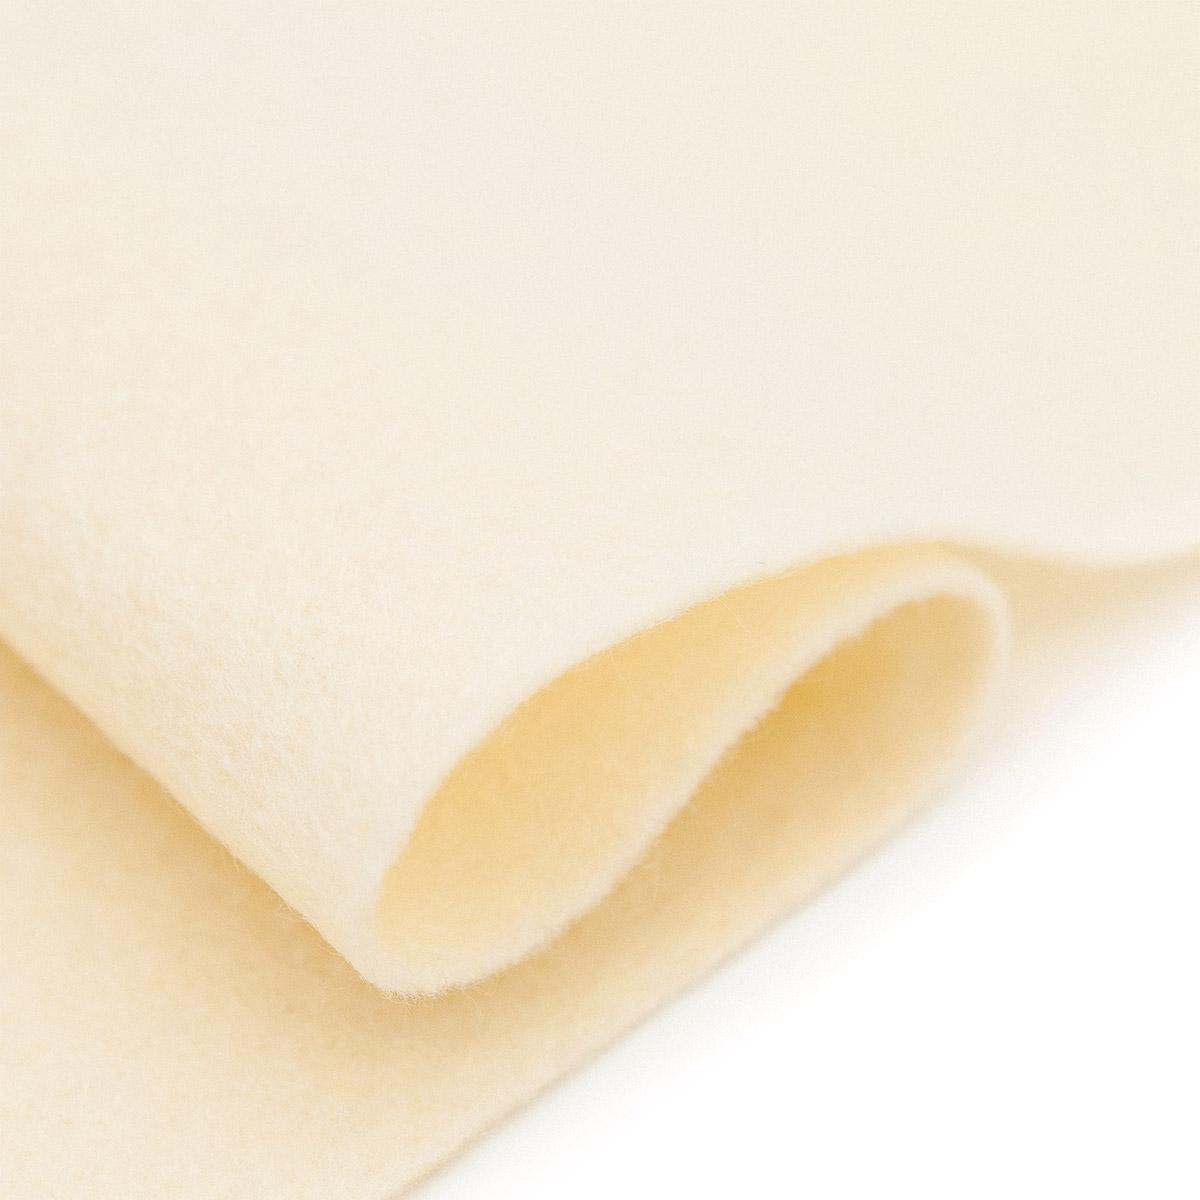 61212612 Фетр для творчества, кремовый, 2мм, 20x30см, уп./1шт. Glorex